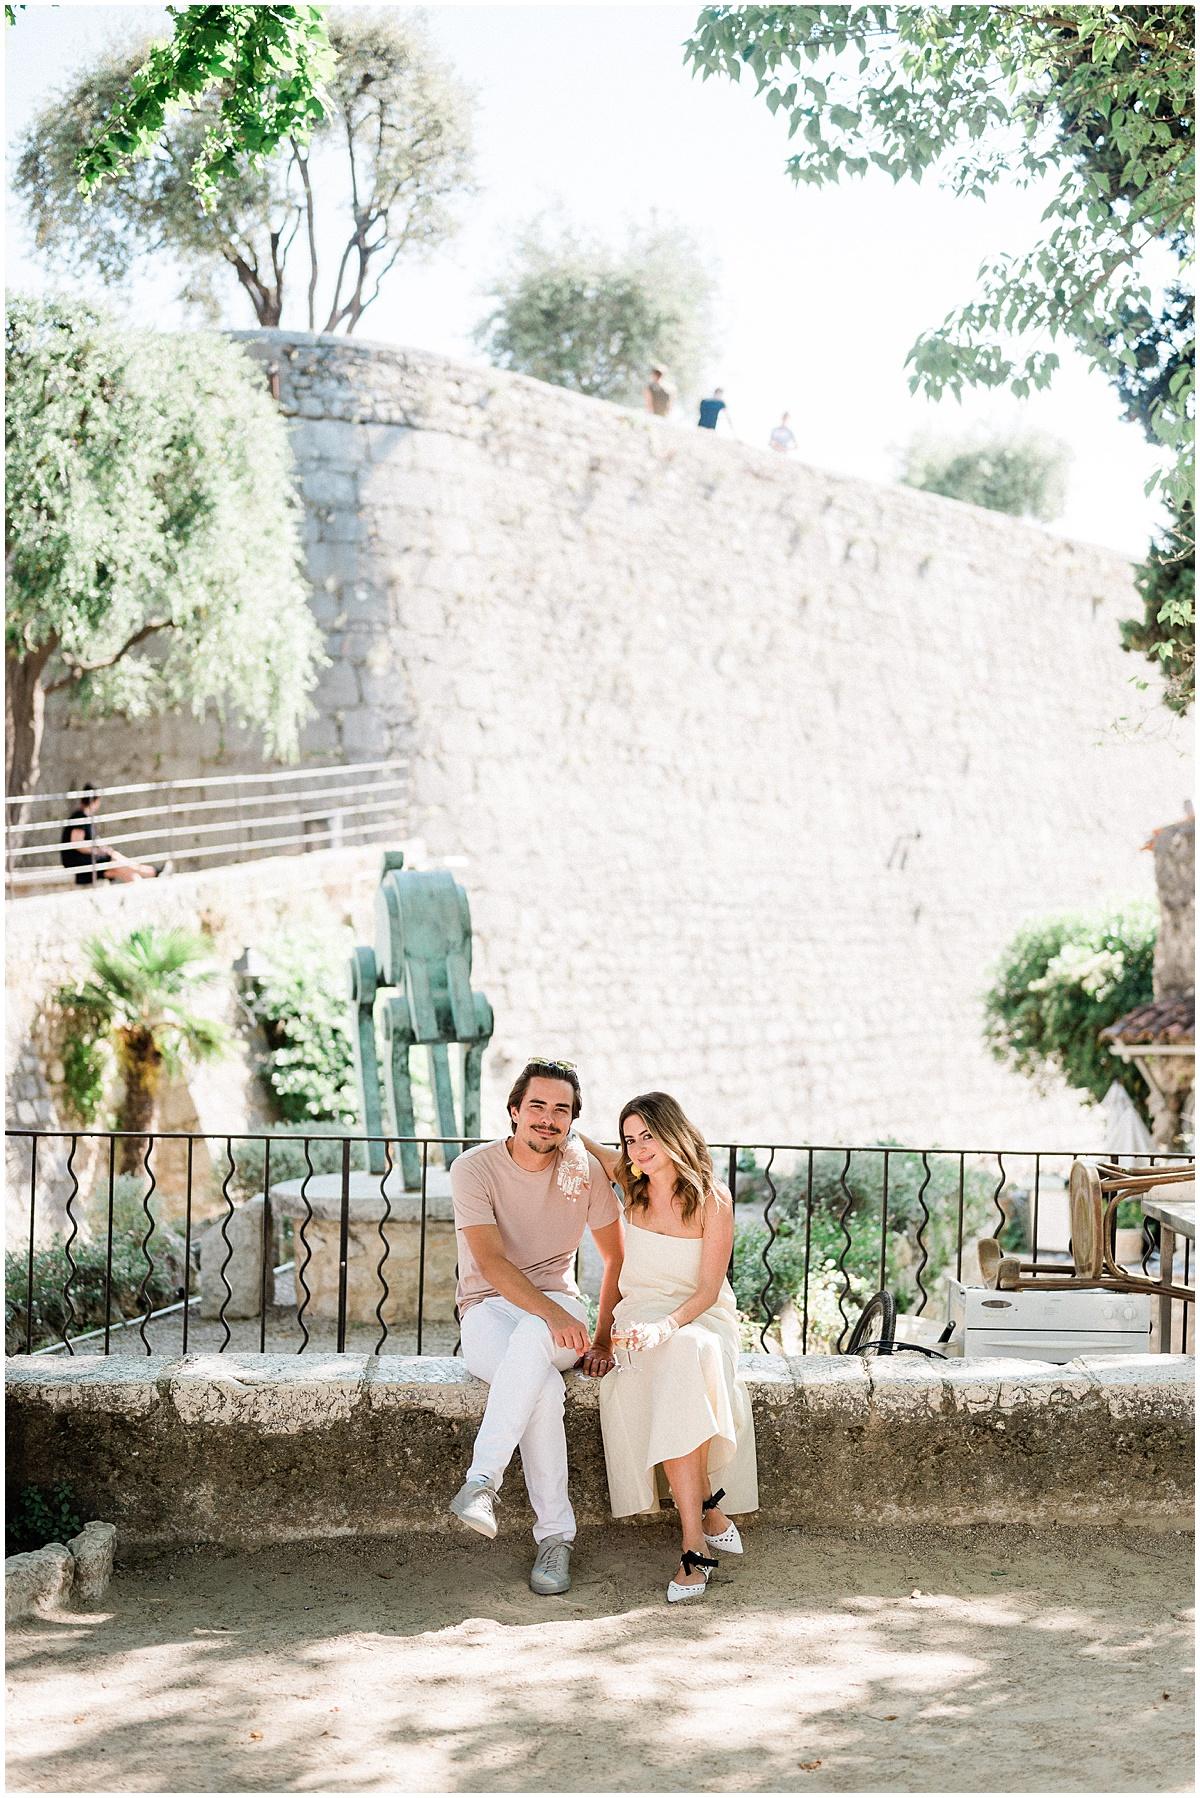 Destination wedding anniversary French Riviera Photographer